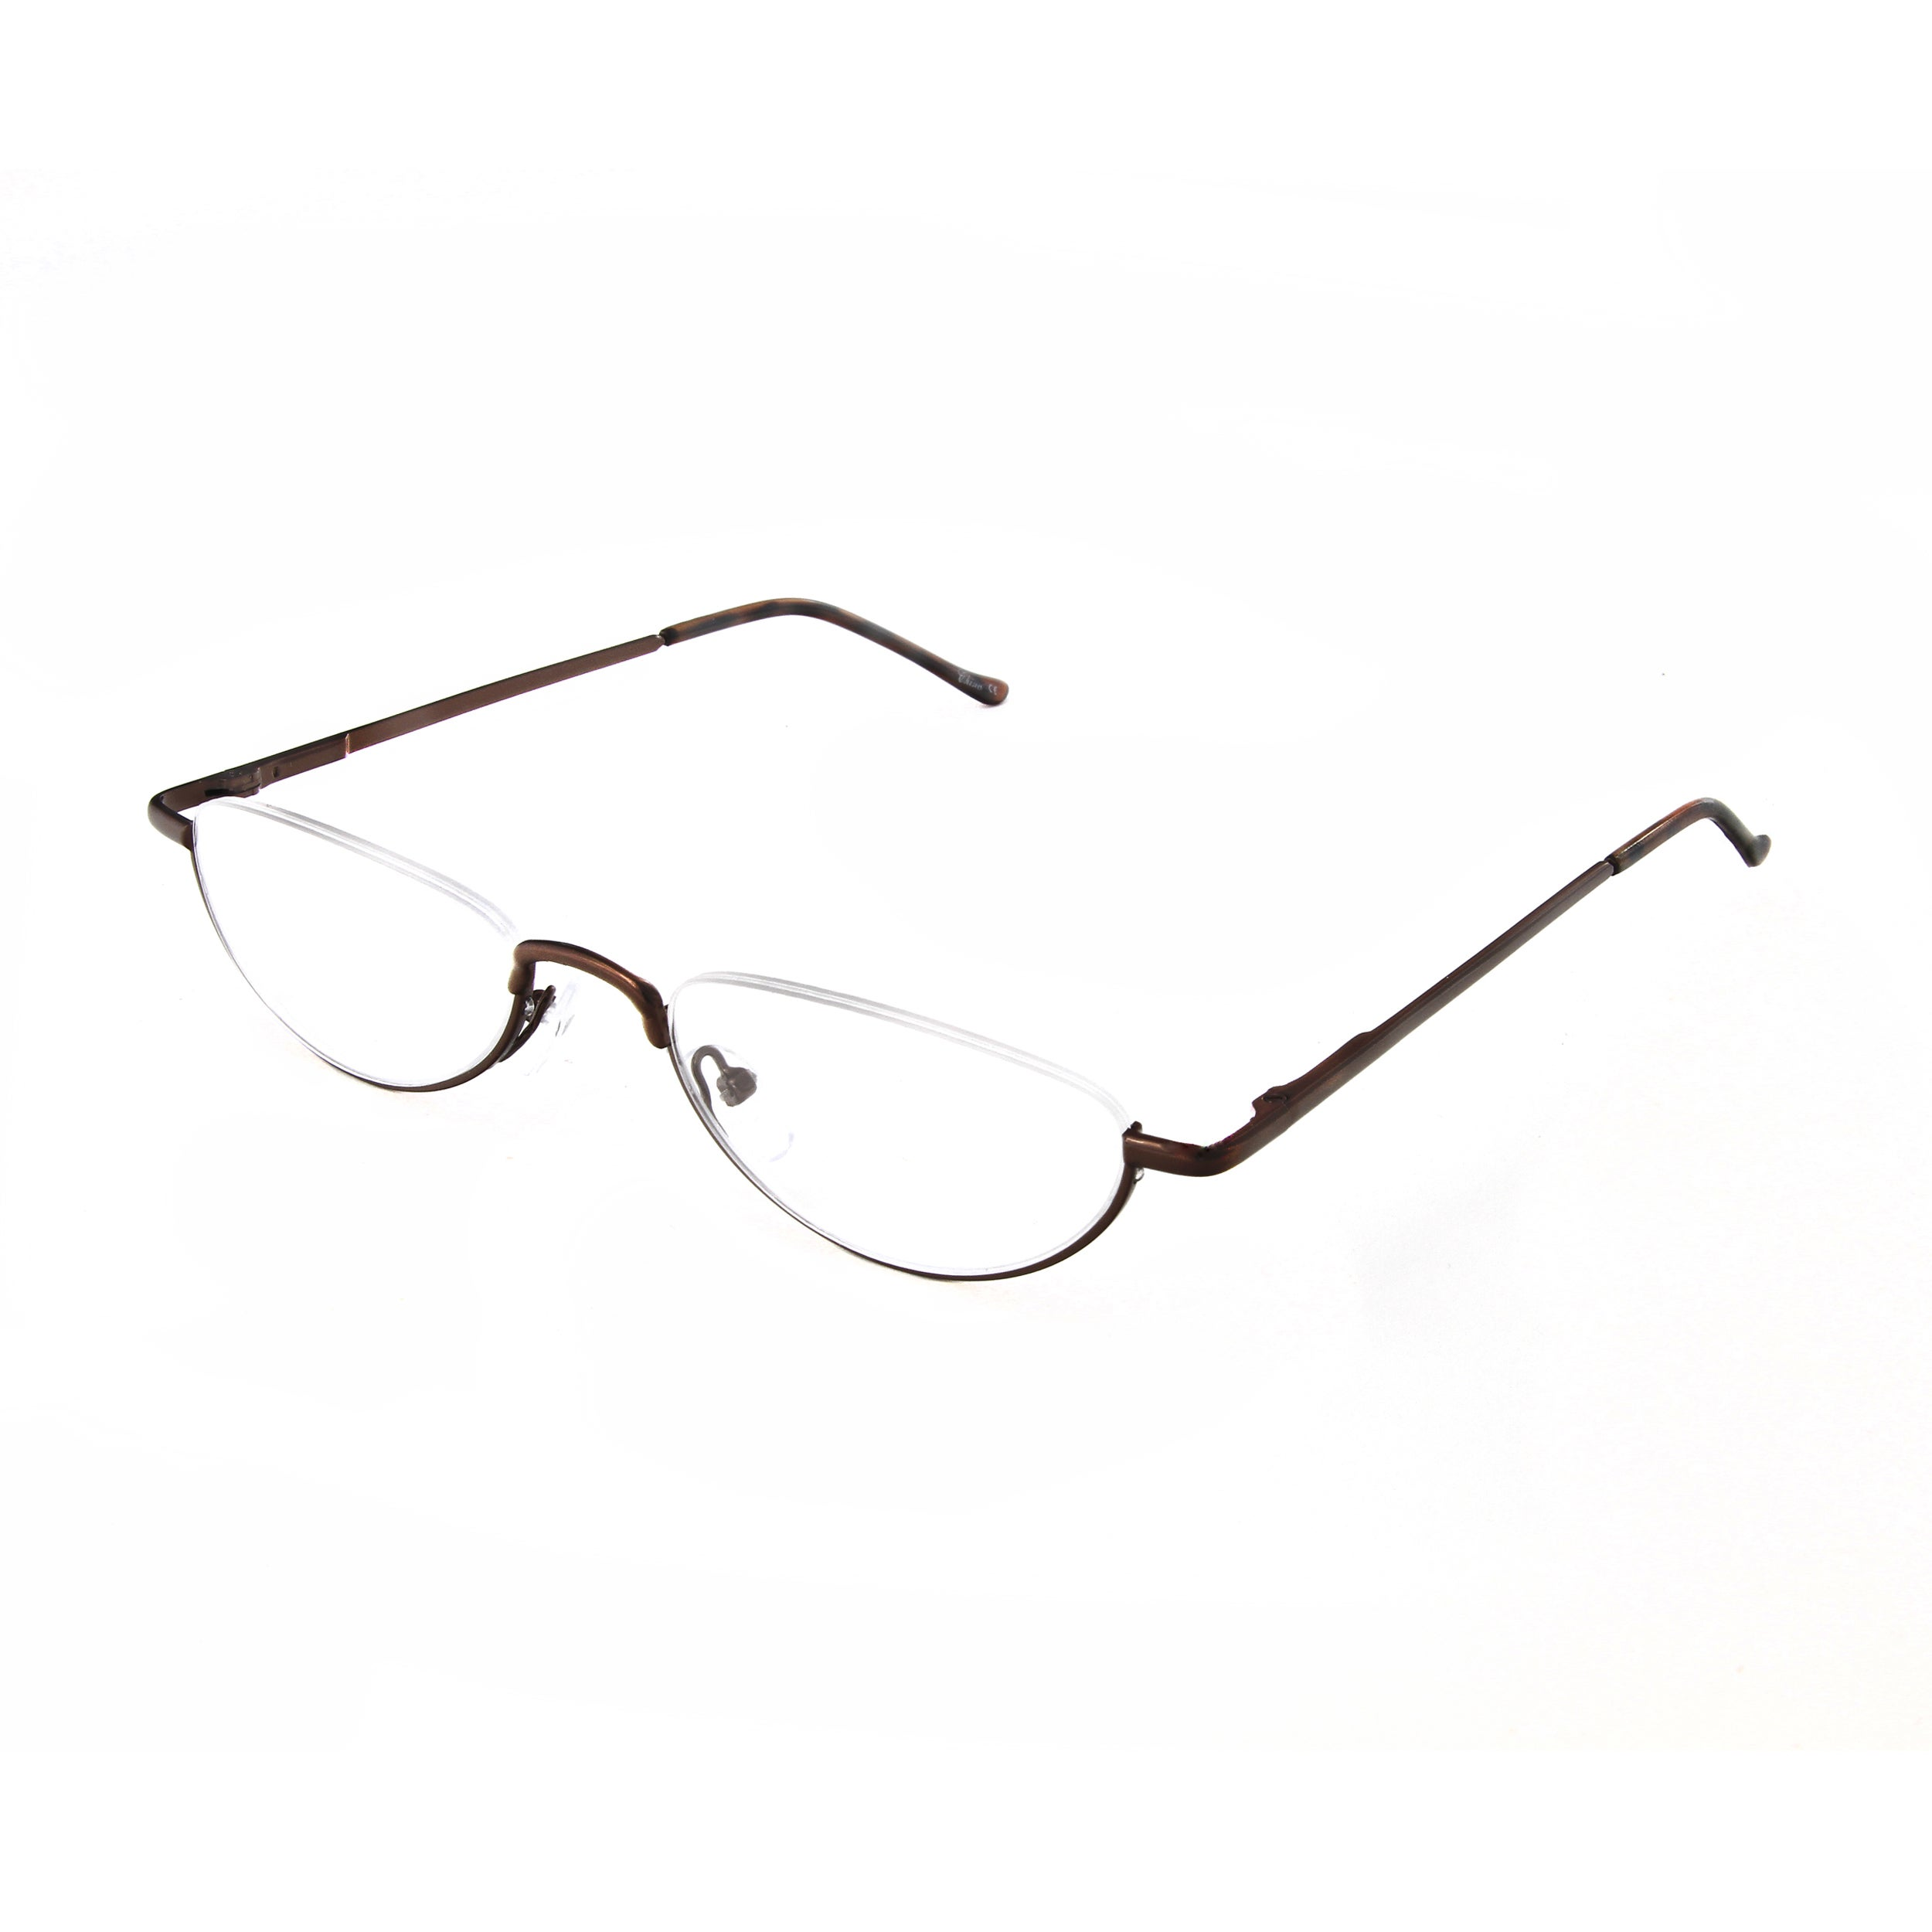 1dab7753f0 Flexon Rimless Glasses « One More Soul